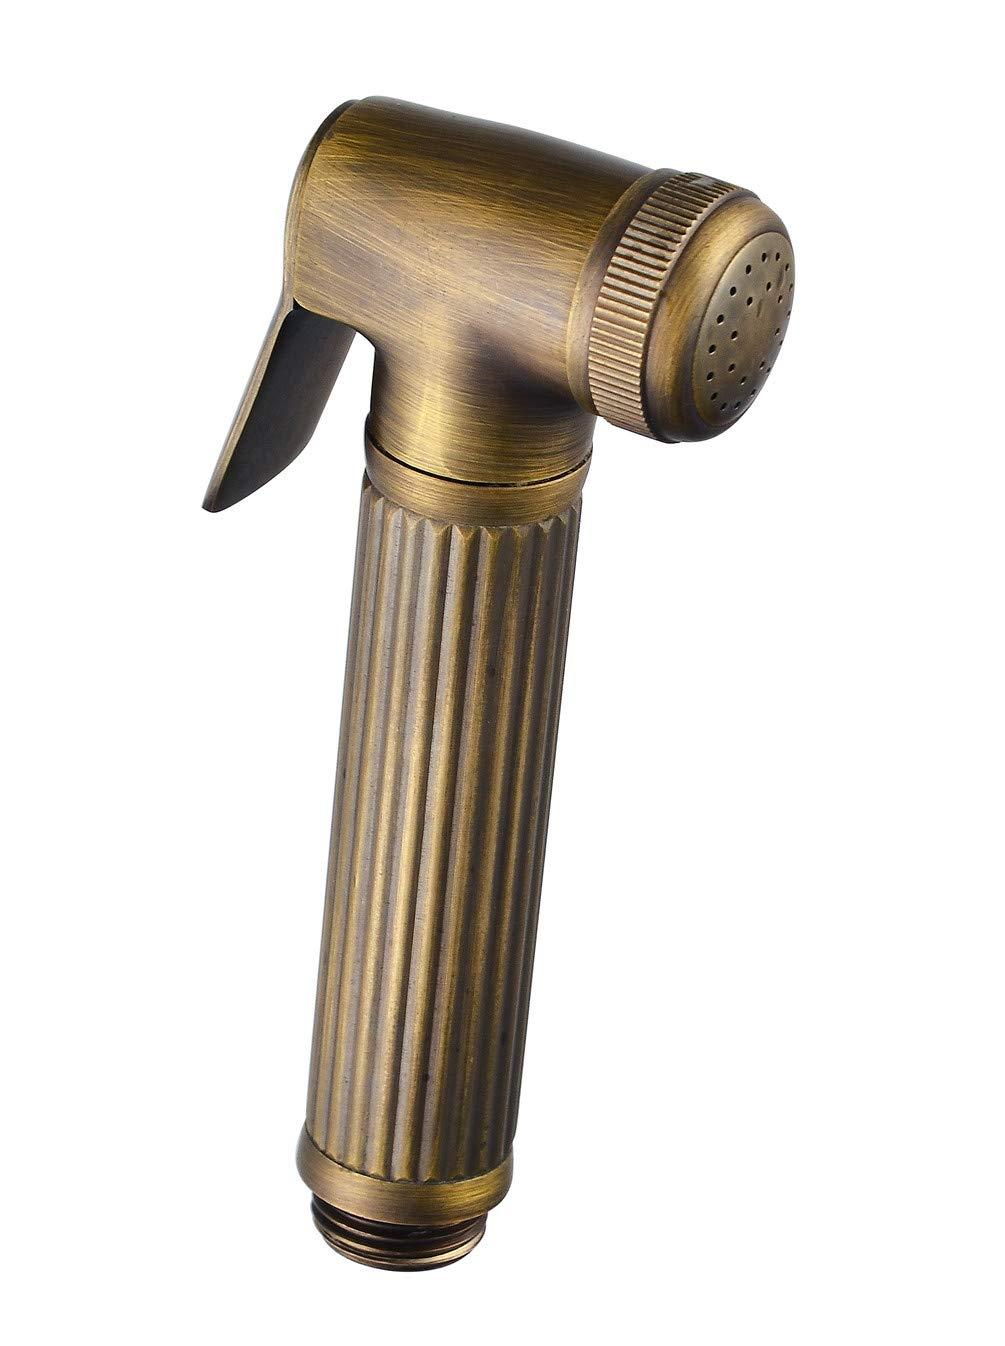 Handheld Bidet Shower Sprayer Head for Toilet Antique Brass Barthroom Cloth Disaper Sprayer Portable Washer Sprayer Gold by MZMULY